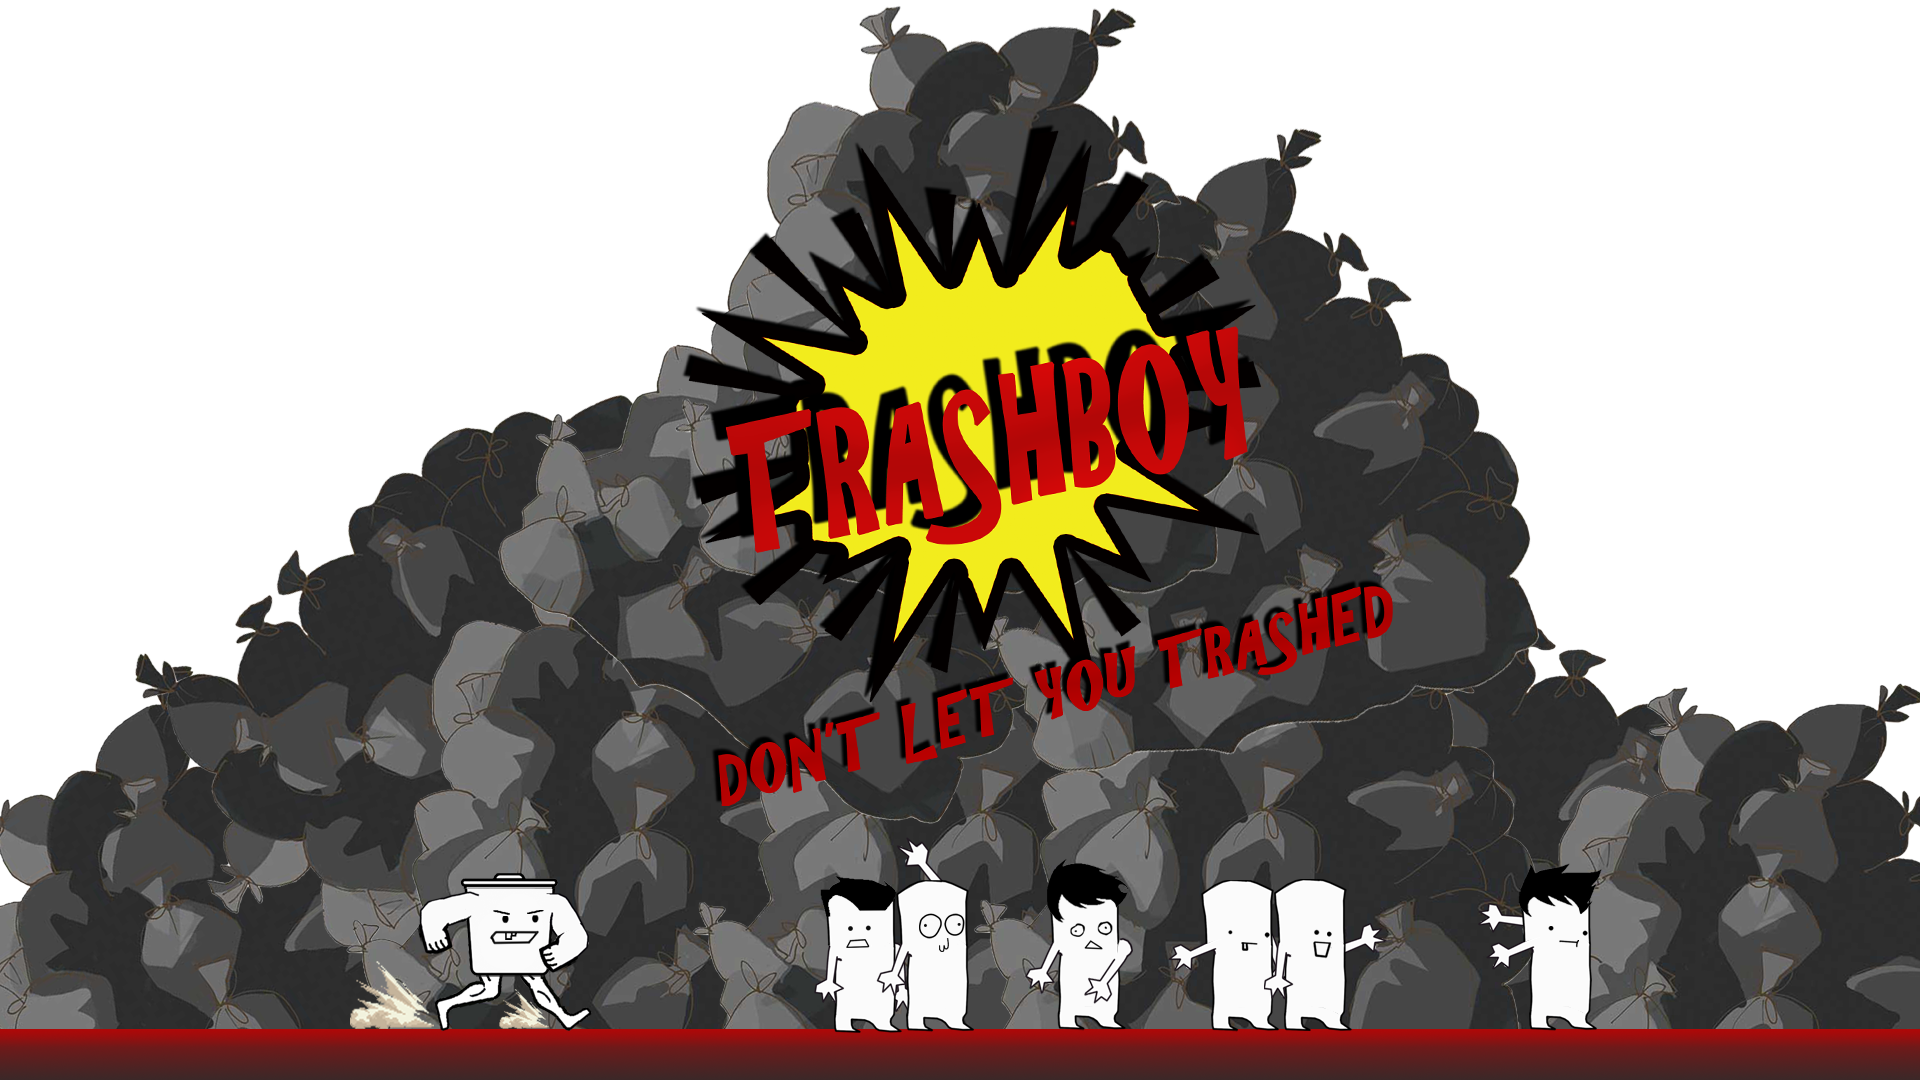 TrashBoy